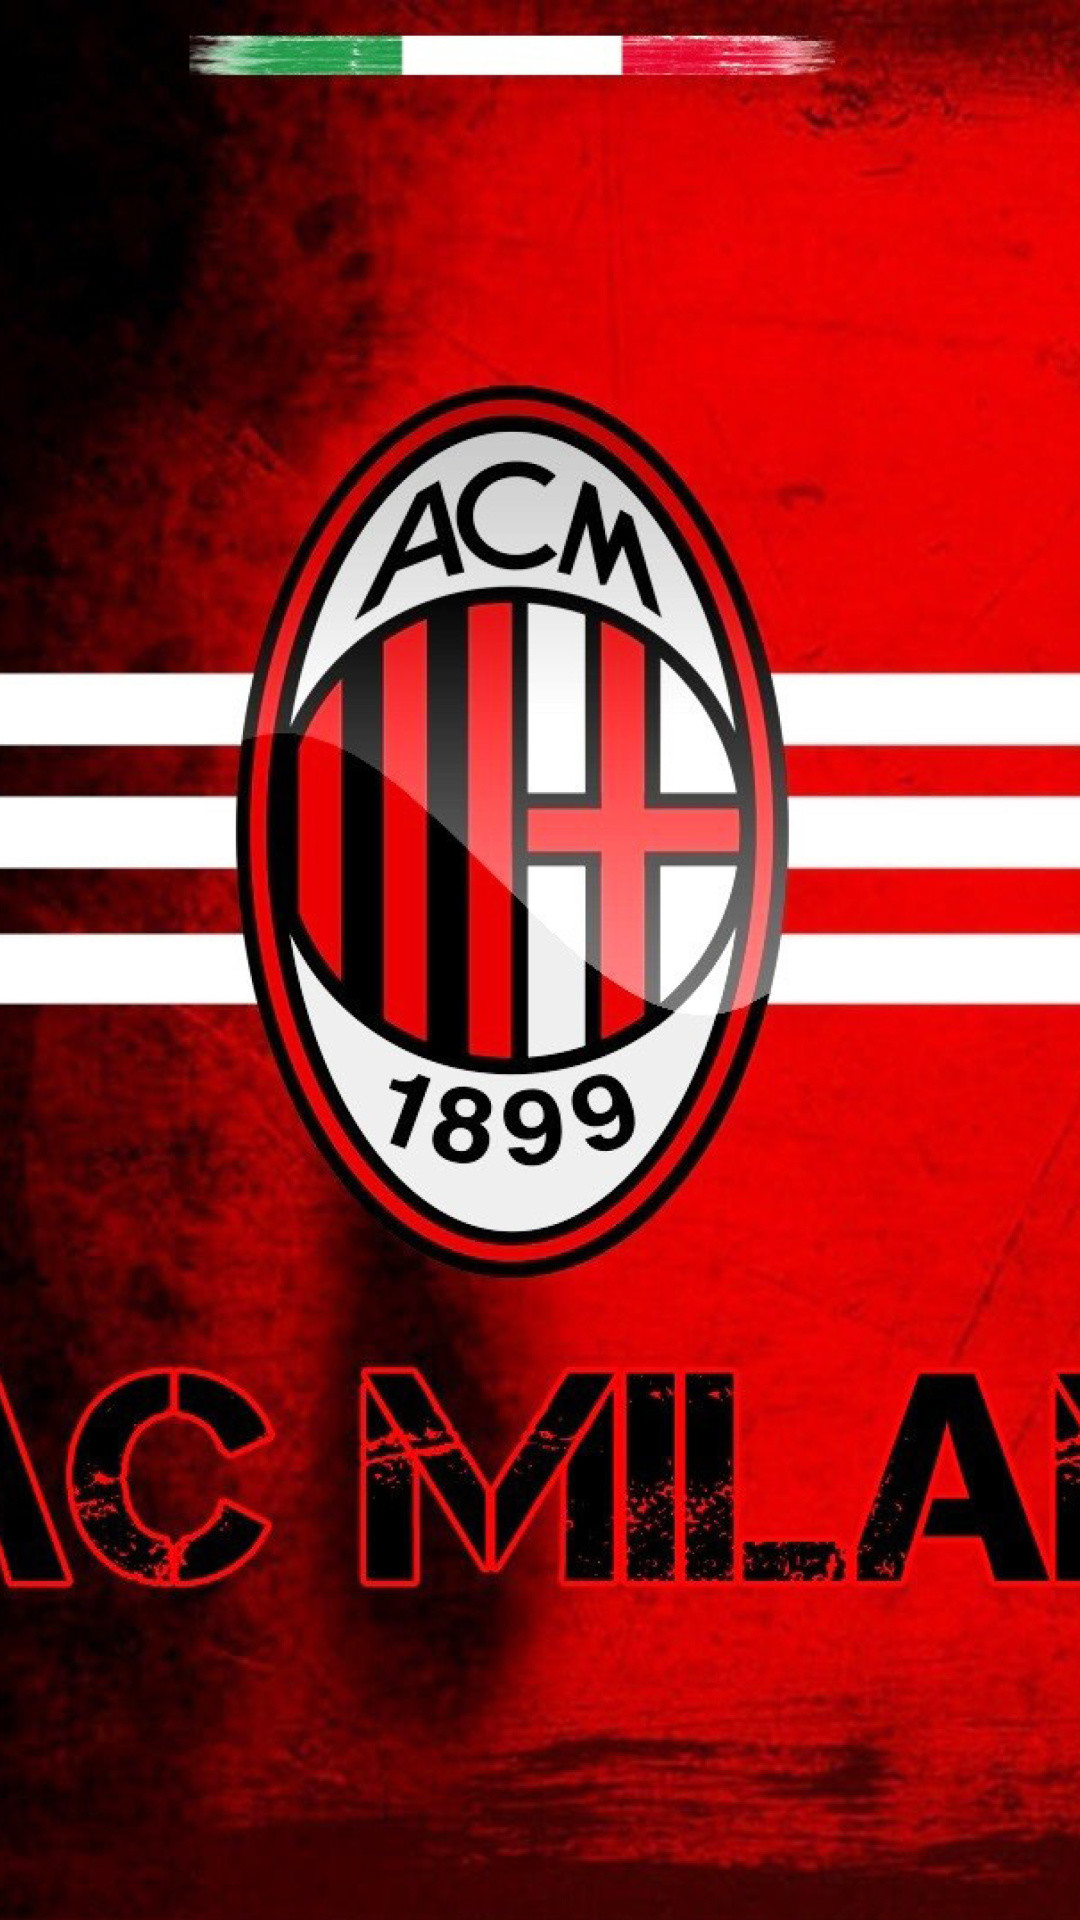 AC Milan 2018 Wallpapers  WallpaperSafari